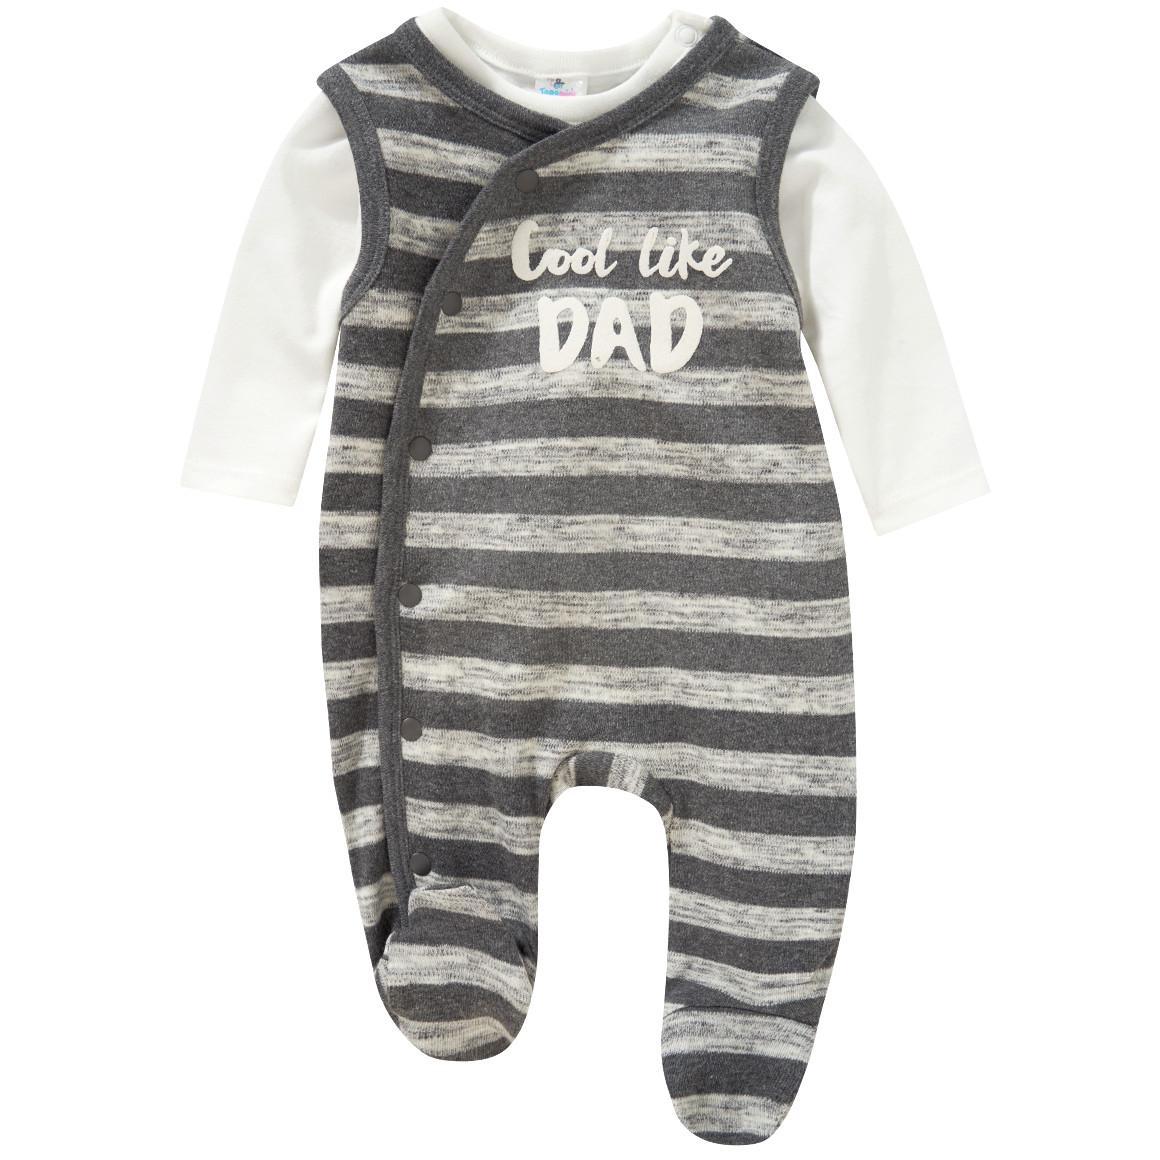 Babystrampler - Newborn Strampler und Shirt im Set - Onlineshop Ernstings family